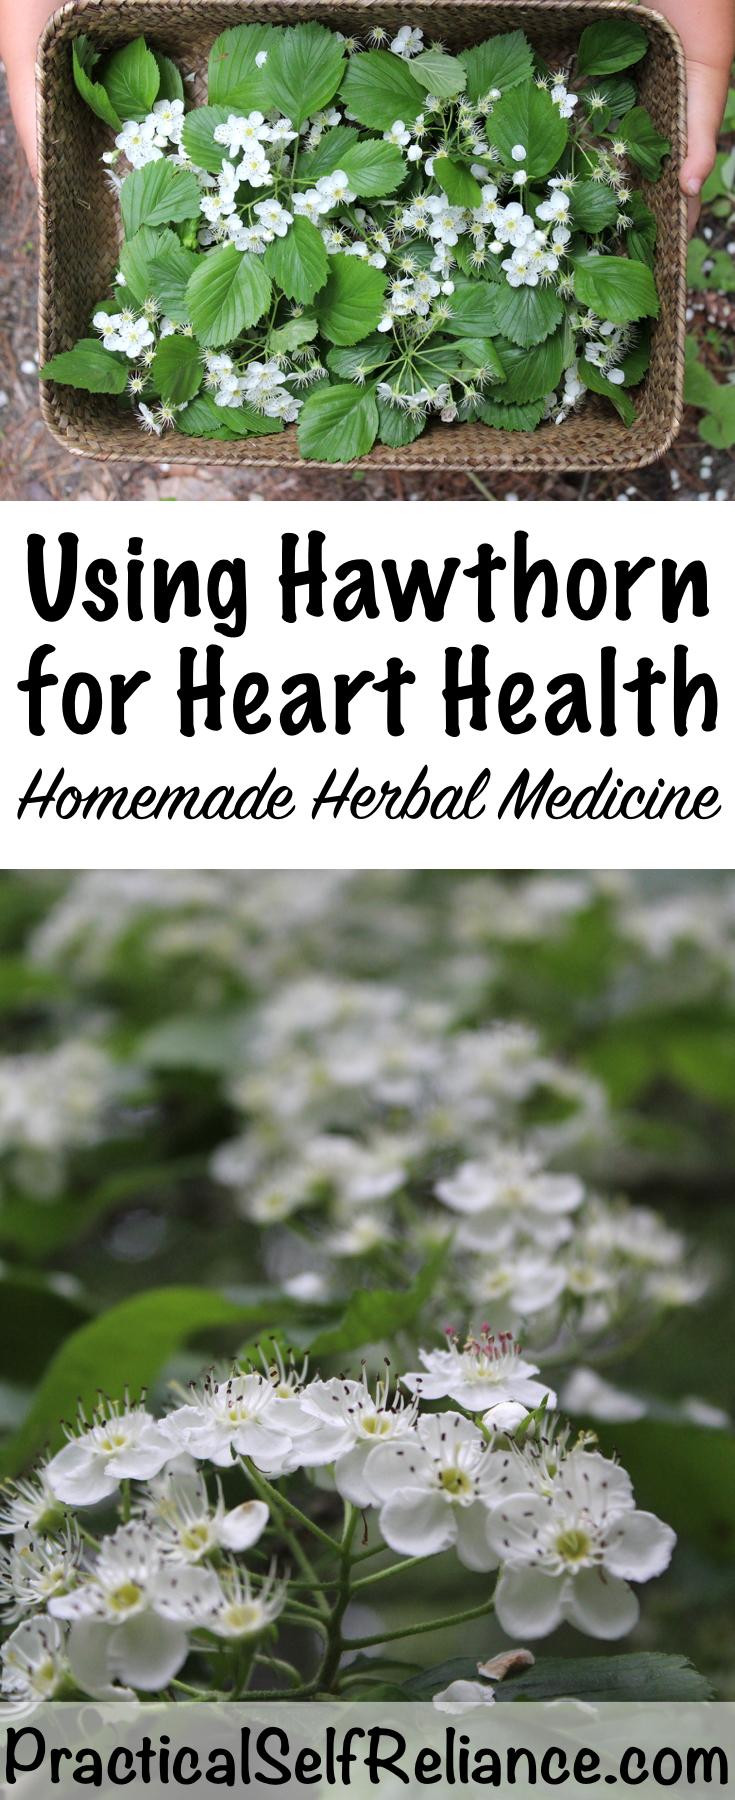 Hawthorn Herbal Medicine